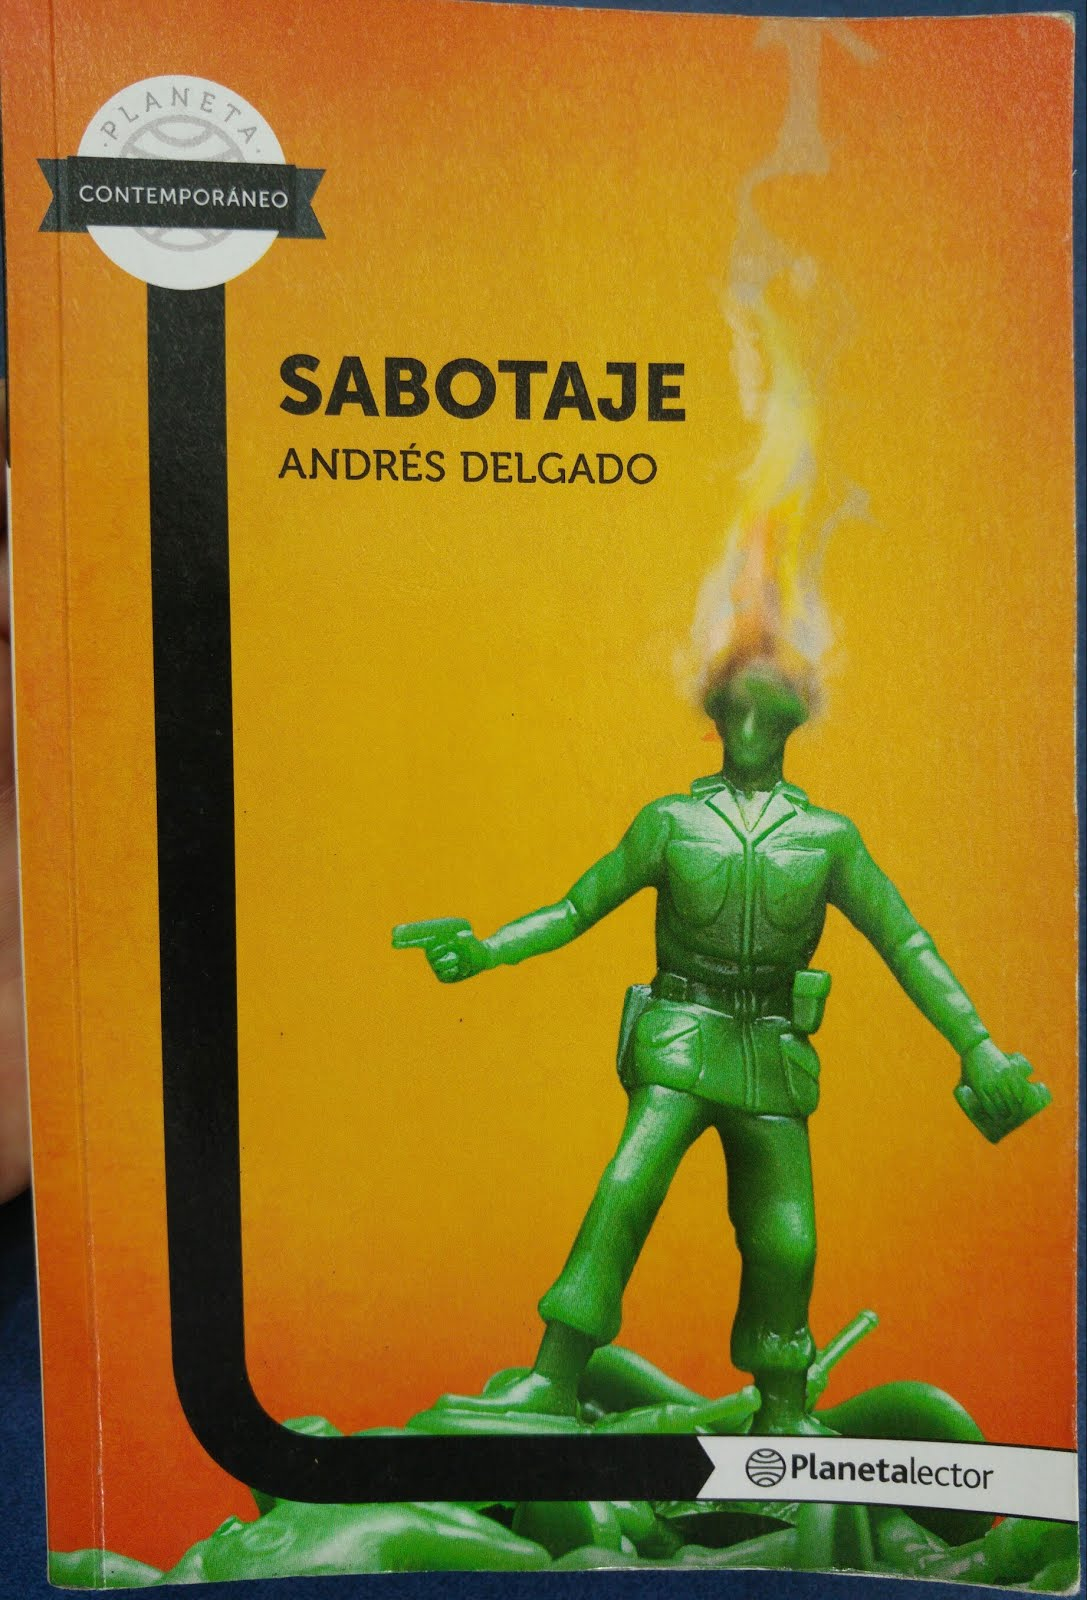 Sabotaje en Planeta lector